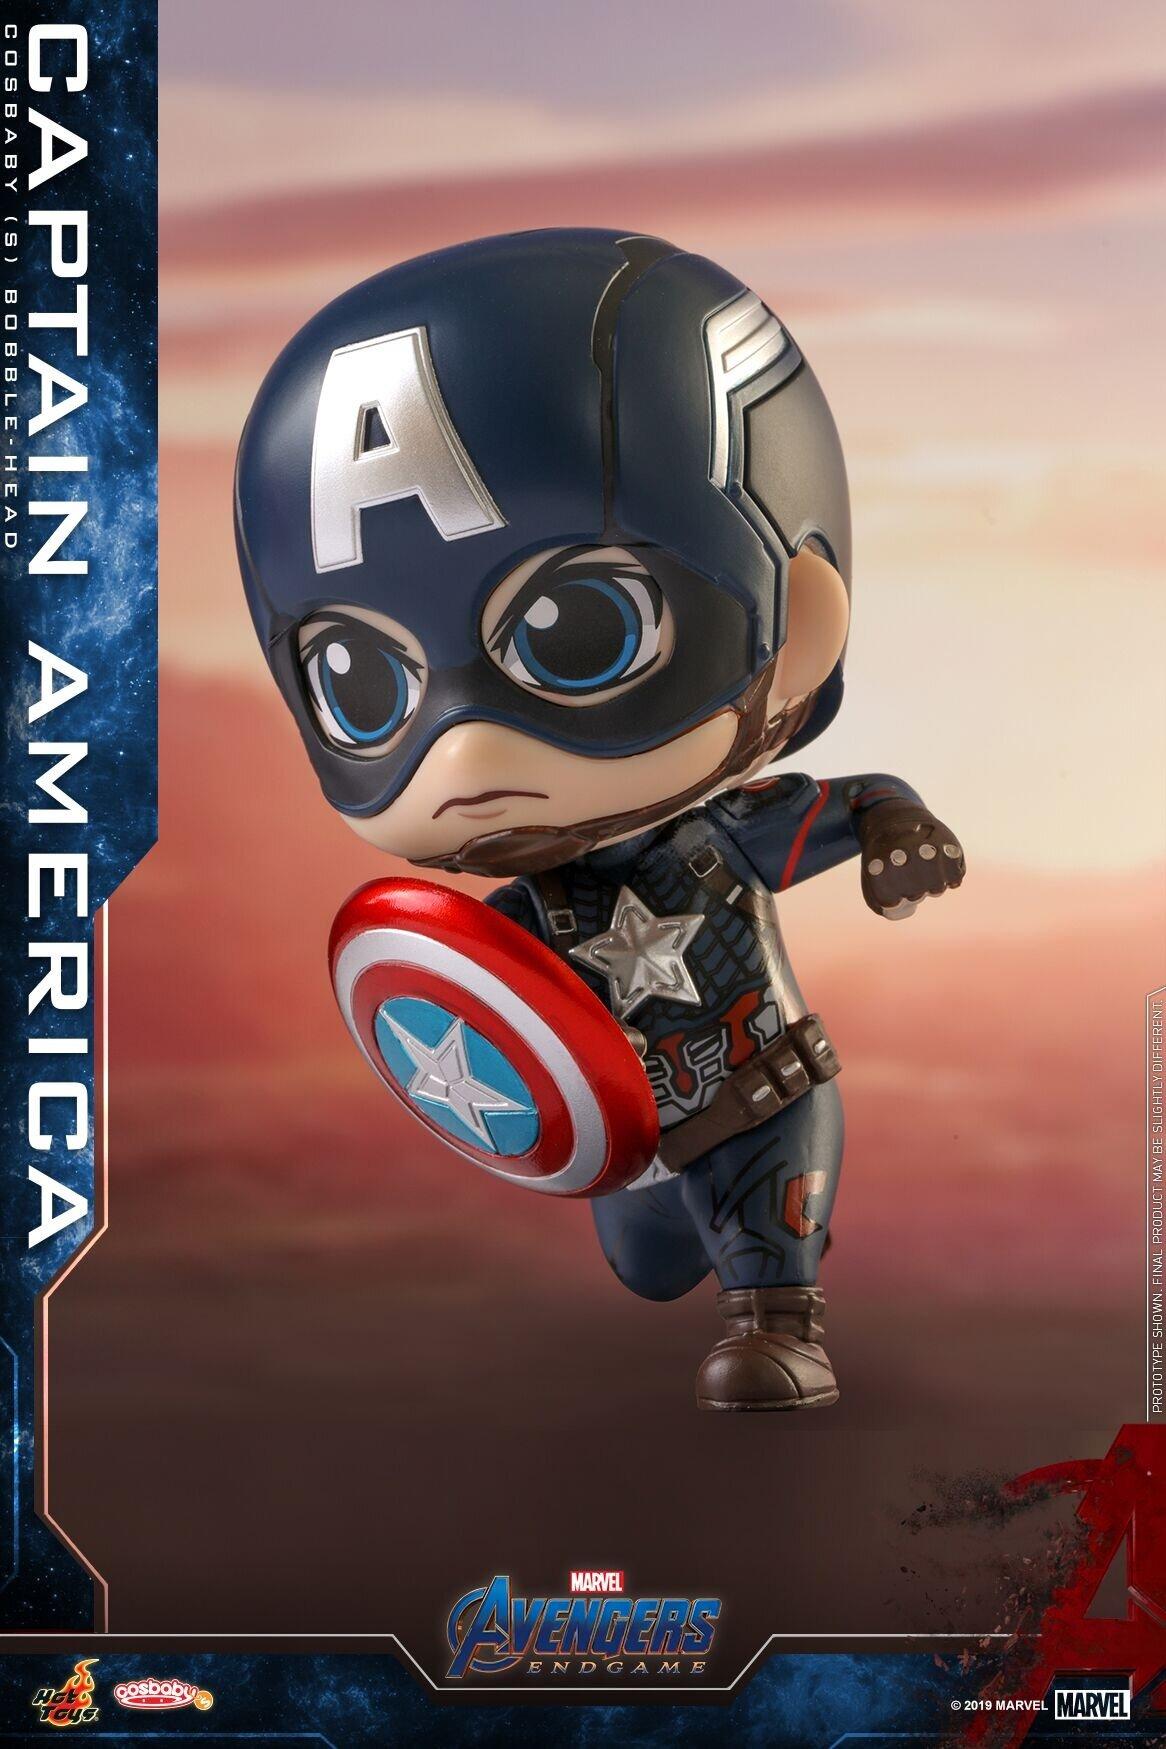 [Hot Toys] 코스베이비 앤드게임 캡틴 아메리카 COSB562